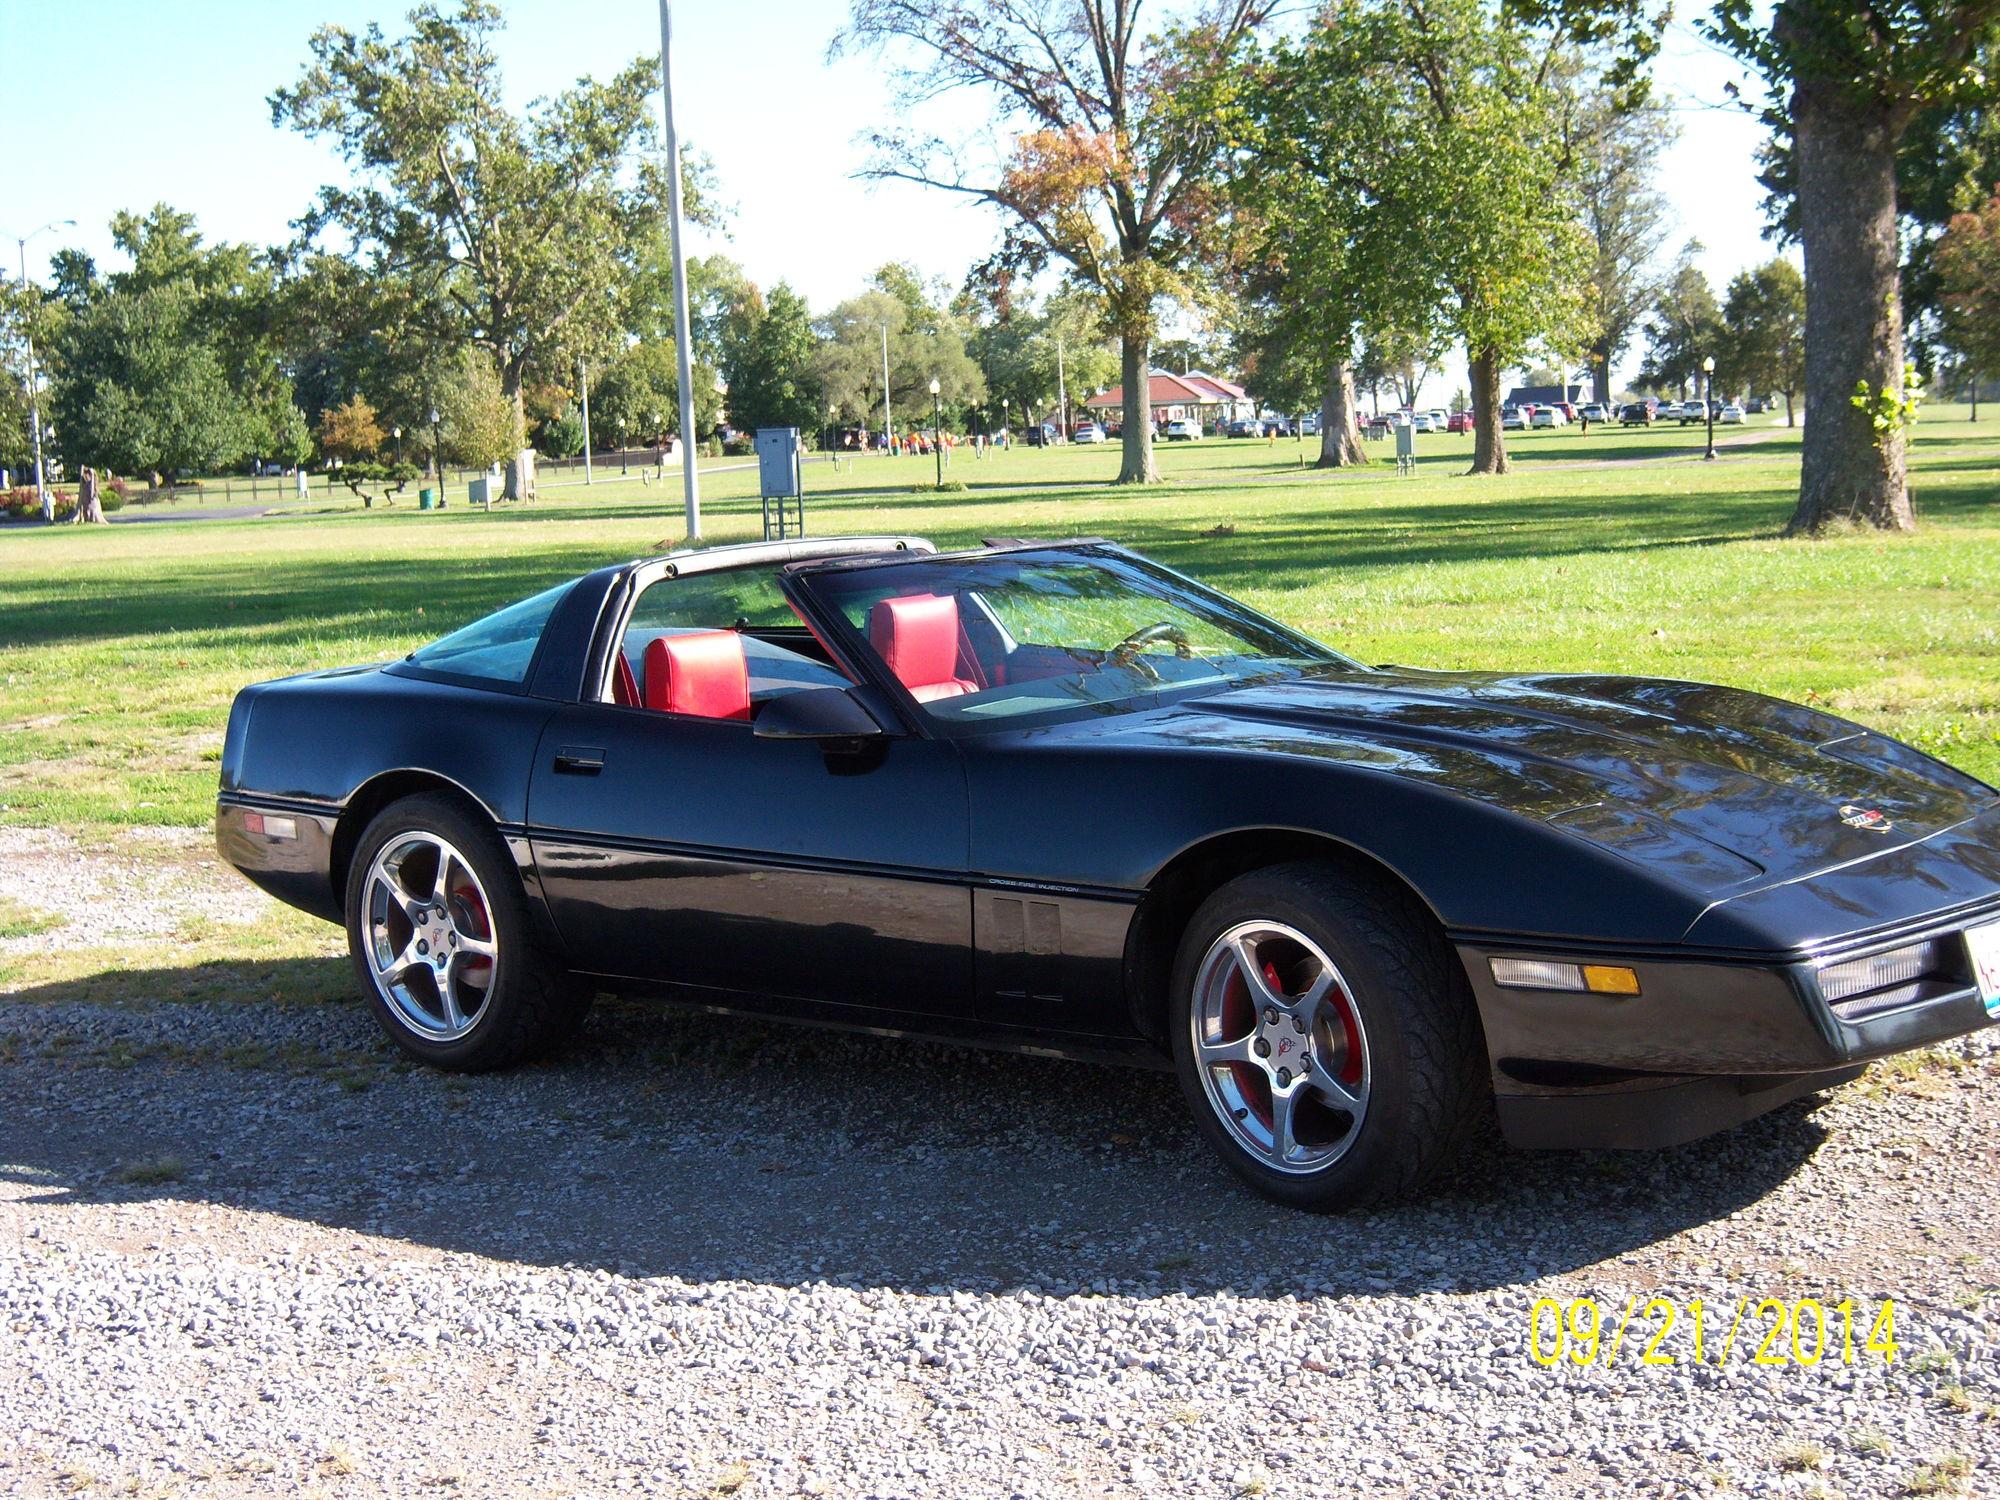 how much to fix up a junk c4 corvetteforum chevrolet corvette. Cars Review. Best American Auto & Cars Review